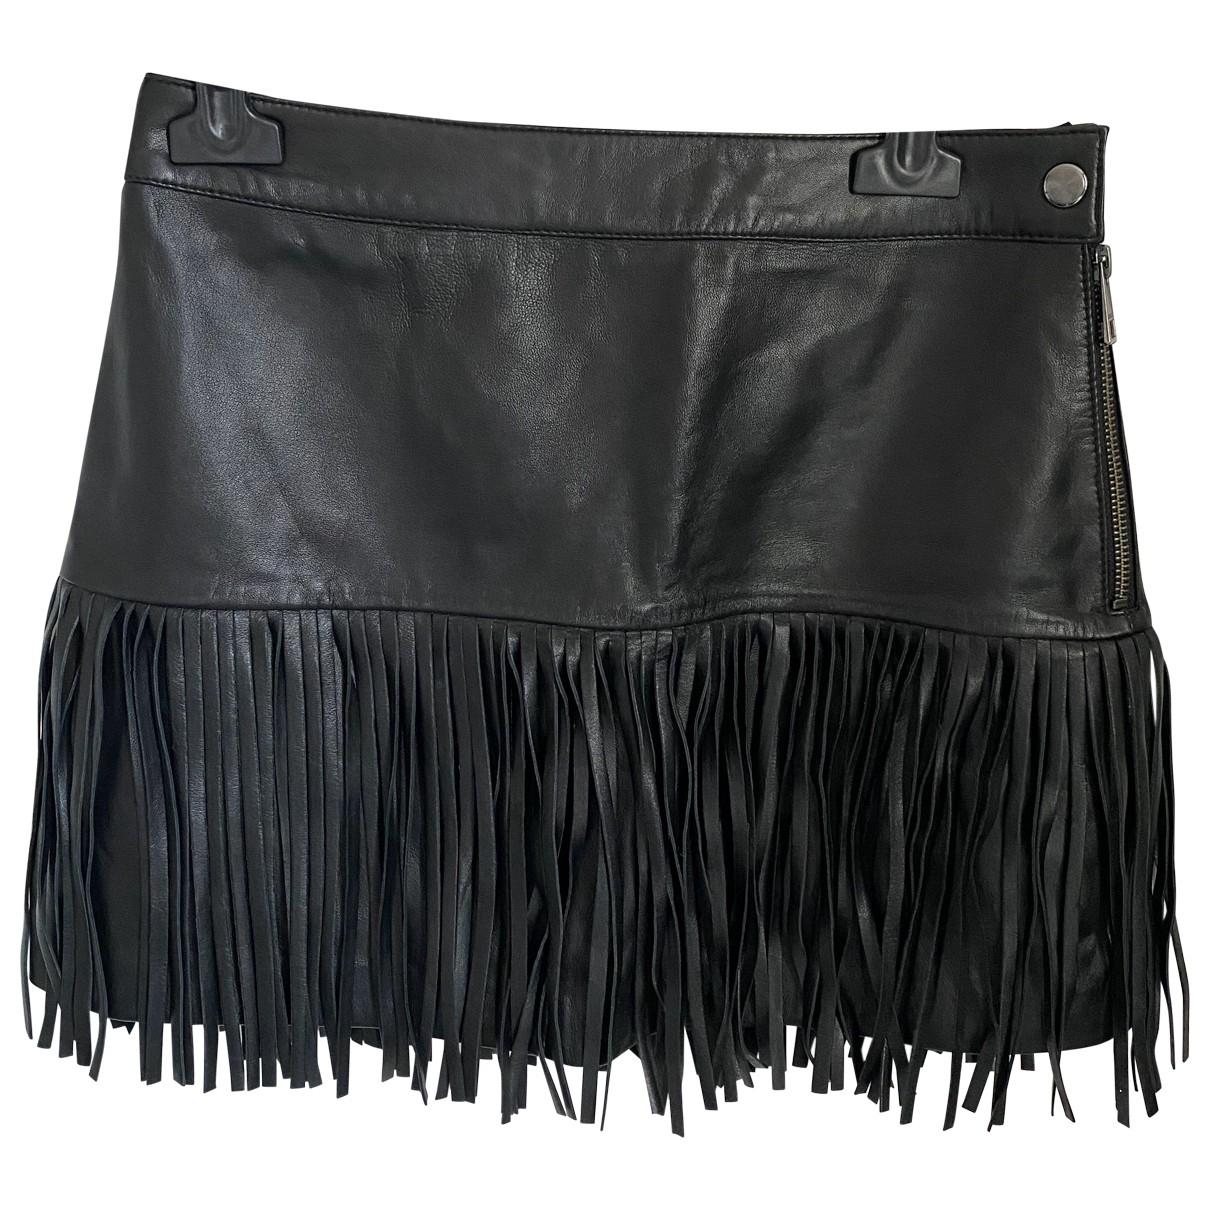 Zadig & Voltaire \N Black Leather skirt for Women 34 FR